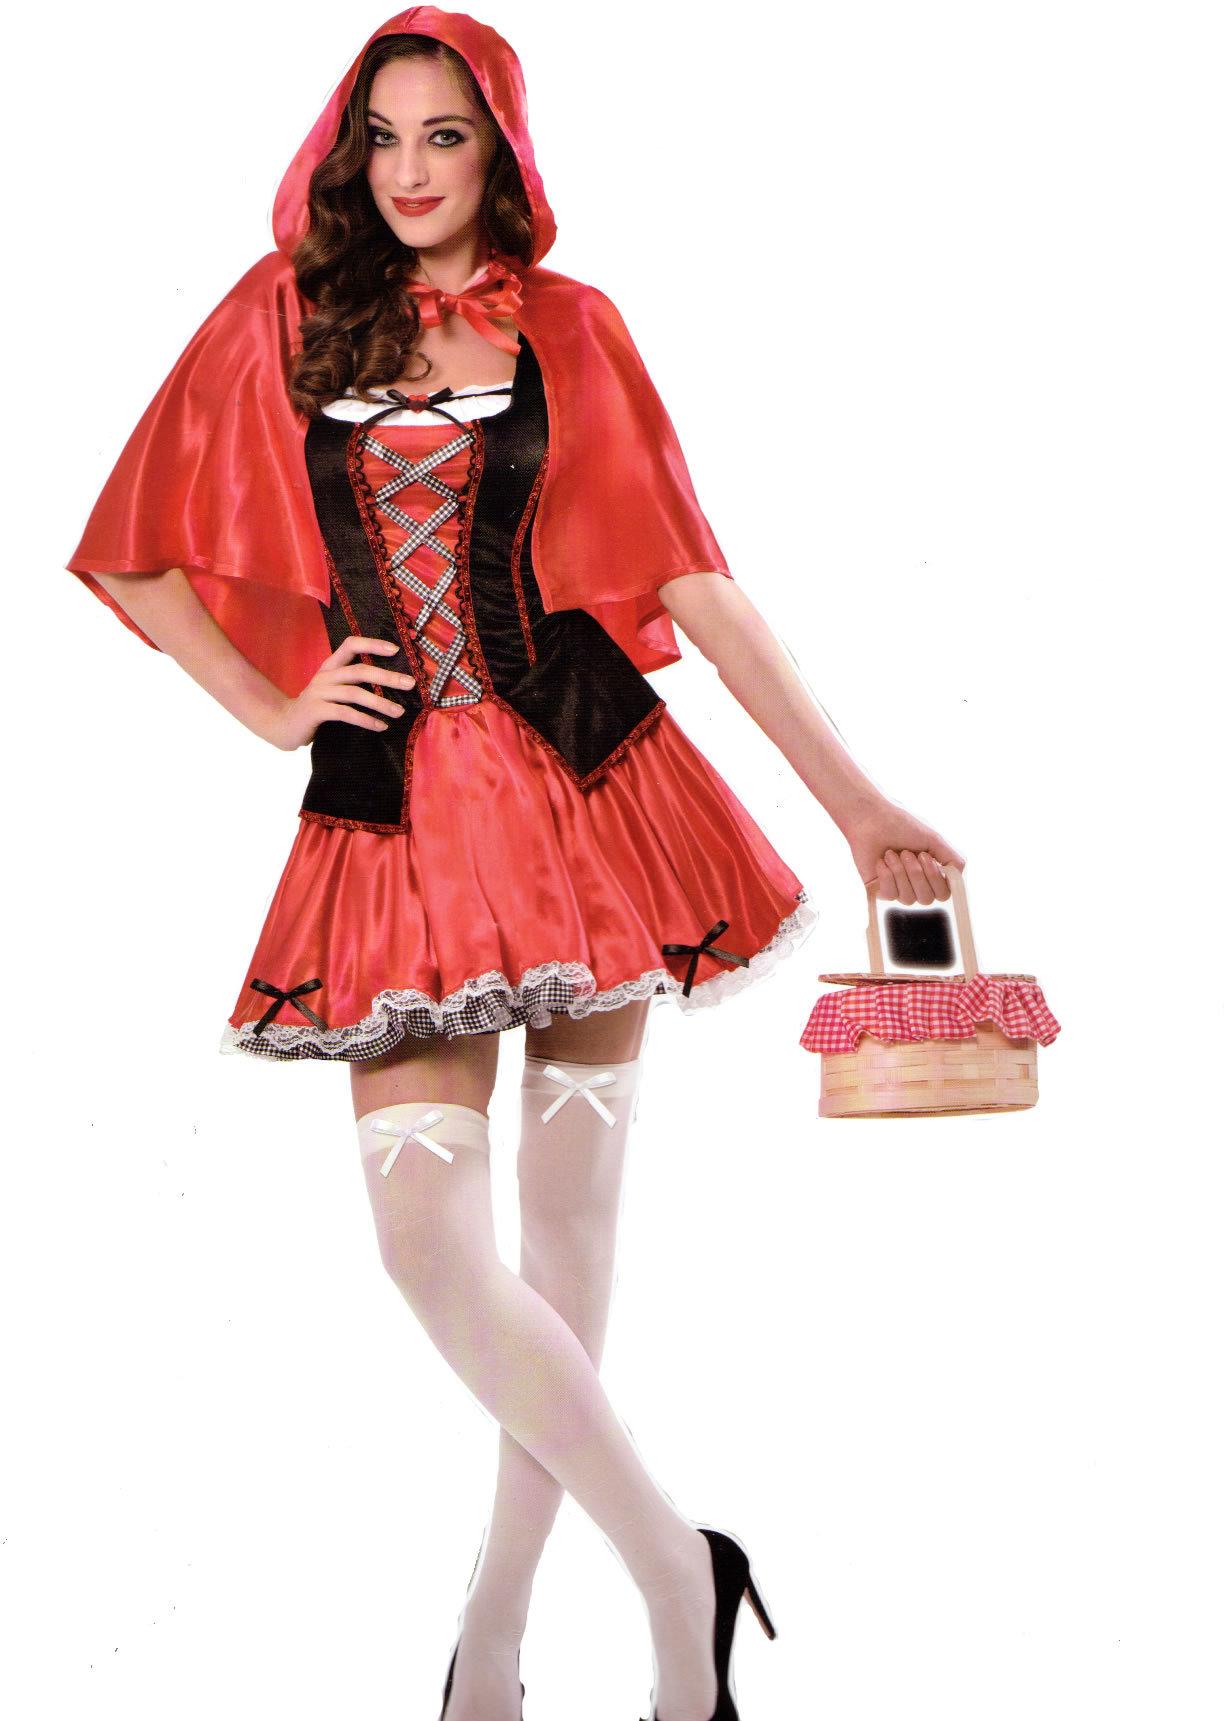 Karneval Damen Kostum Fasching Halloween Parties Pfauen Grosse